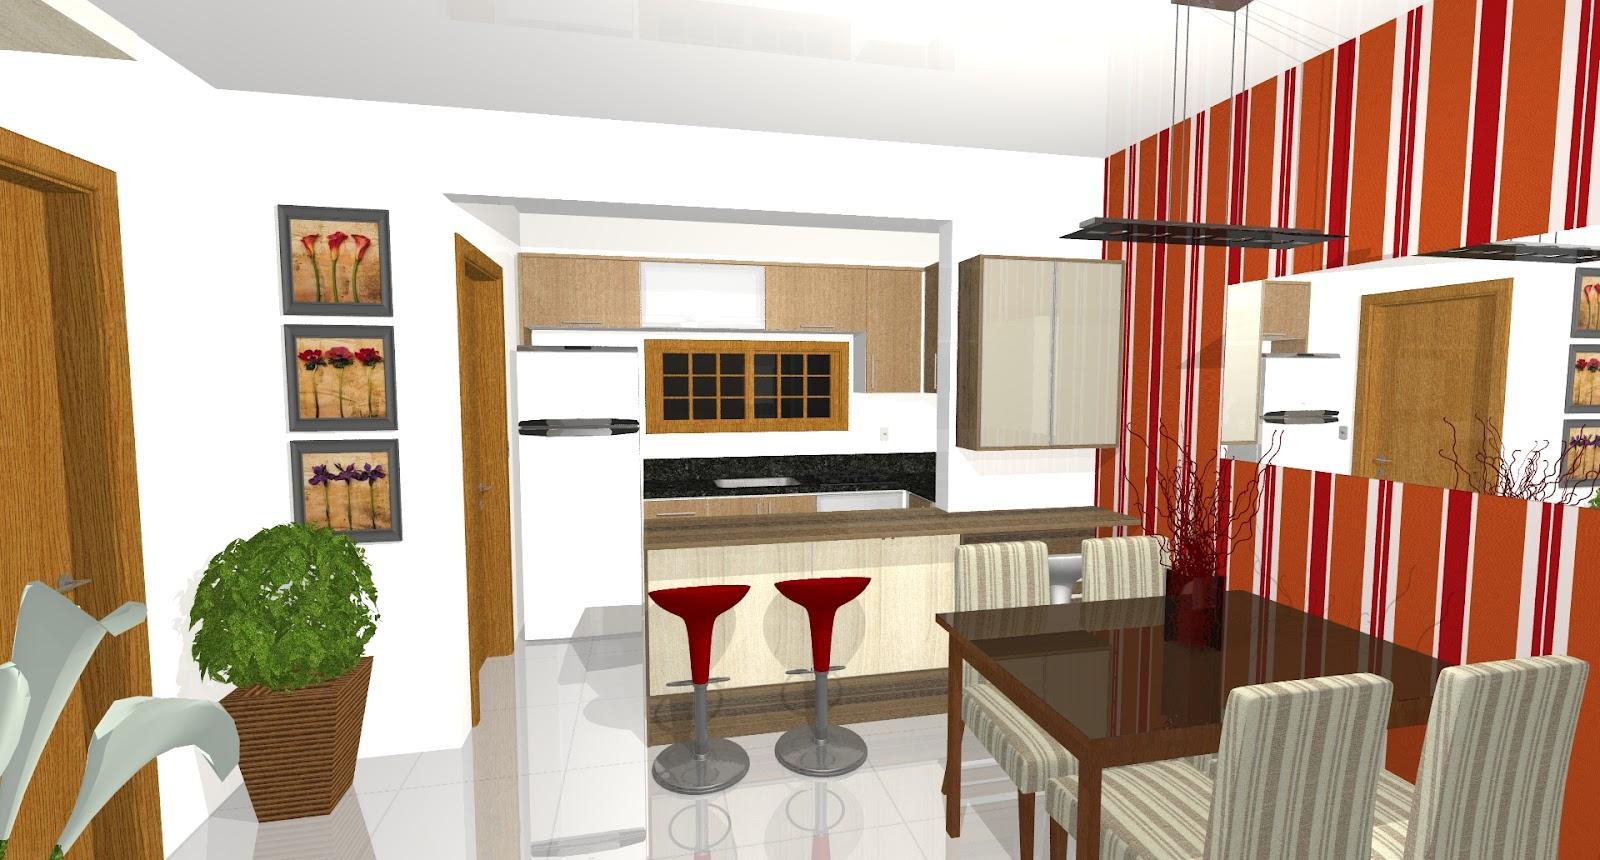 Sala De Jantar Cozinha Galeria De Projetos Promob Car Interior  #AF401C 1600 860